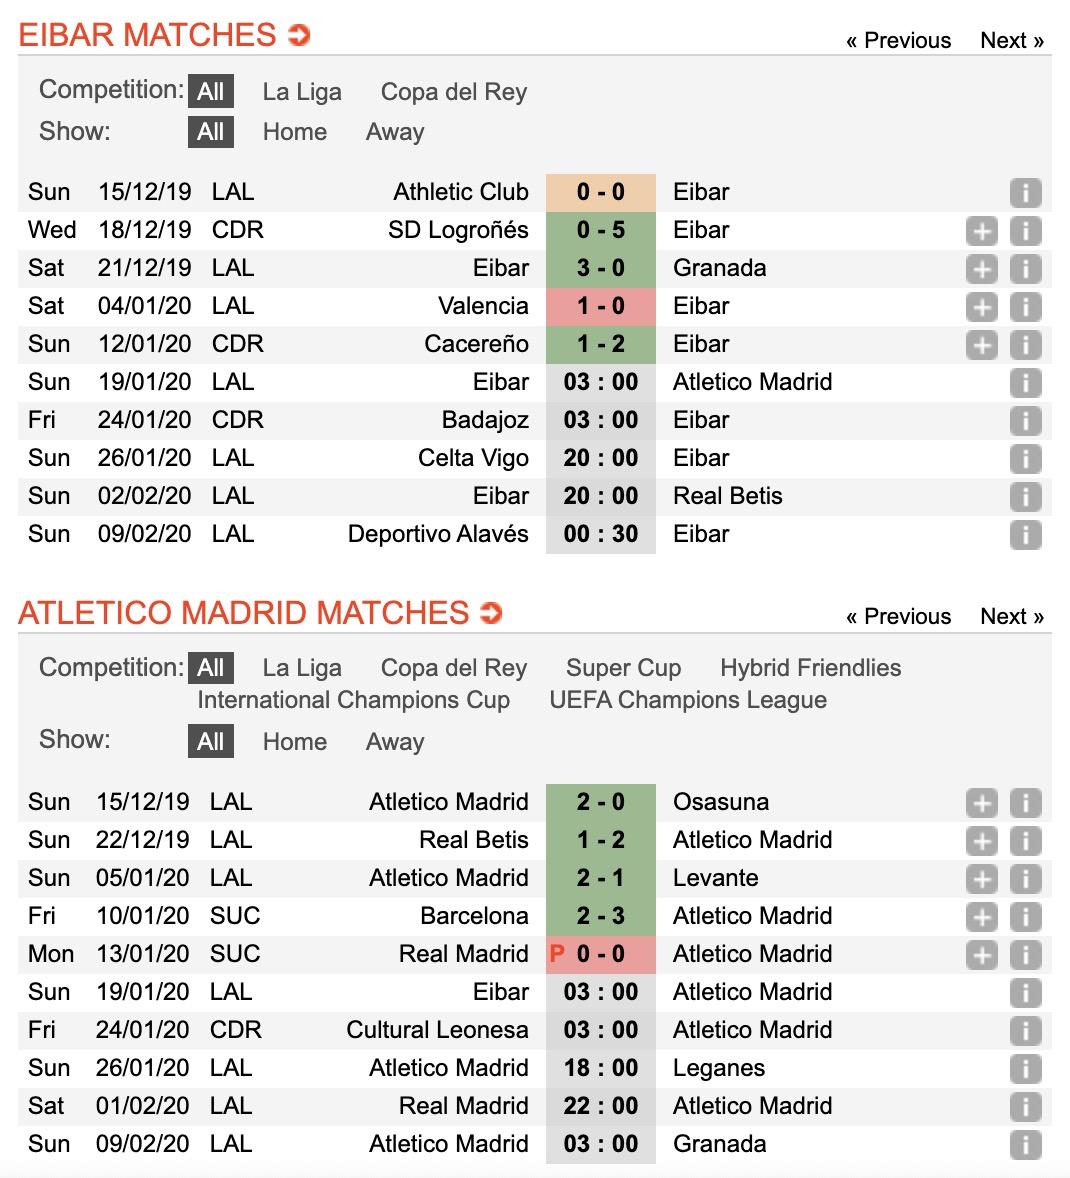 Eibar-vs-Atletico Madrid-soi-keo-vdqg-italia-13-01-ba-dam-meu-mao-4